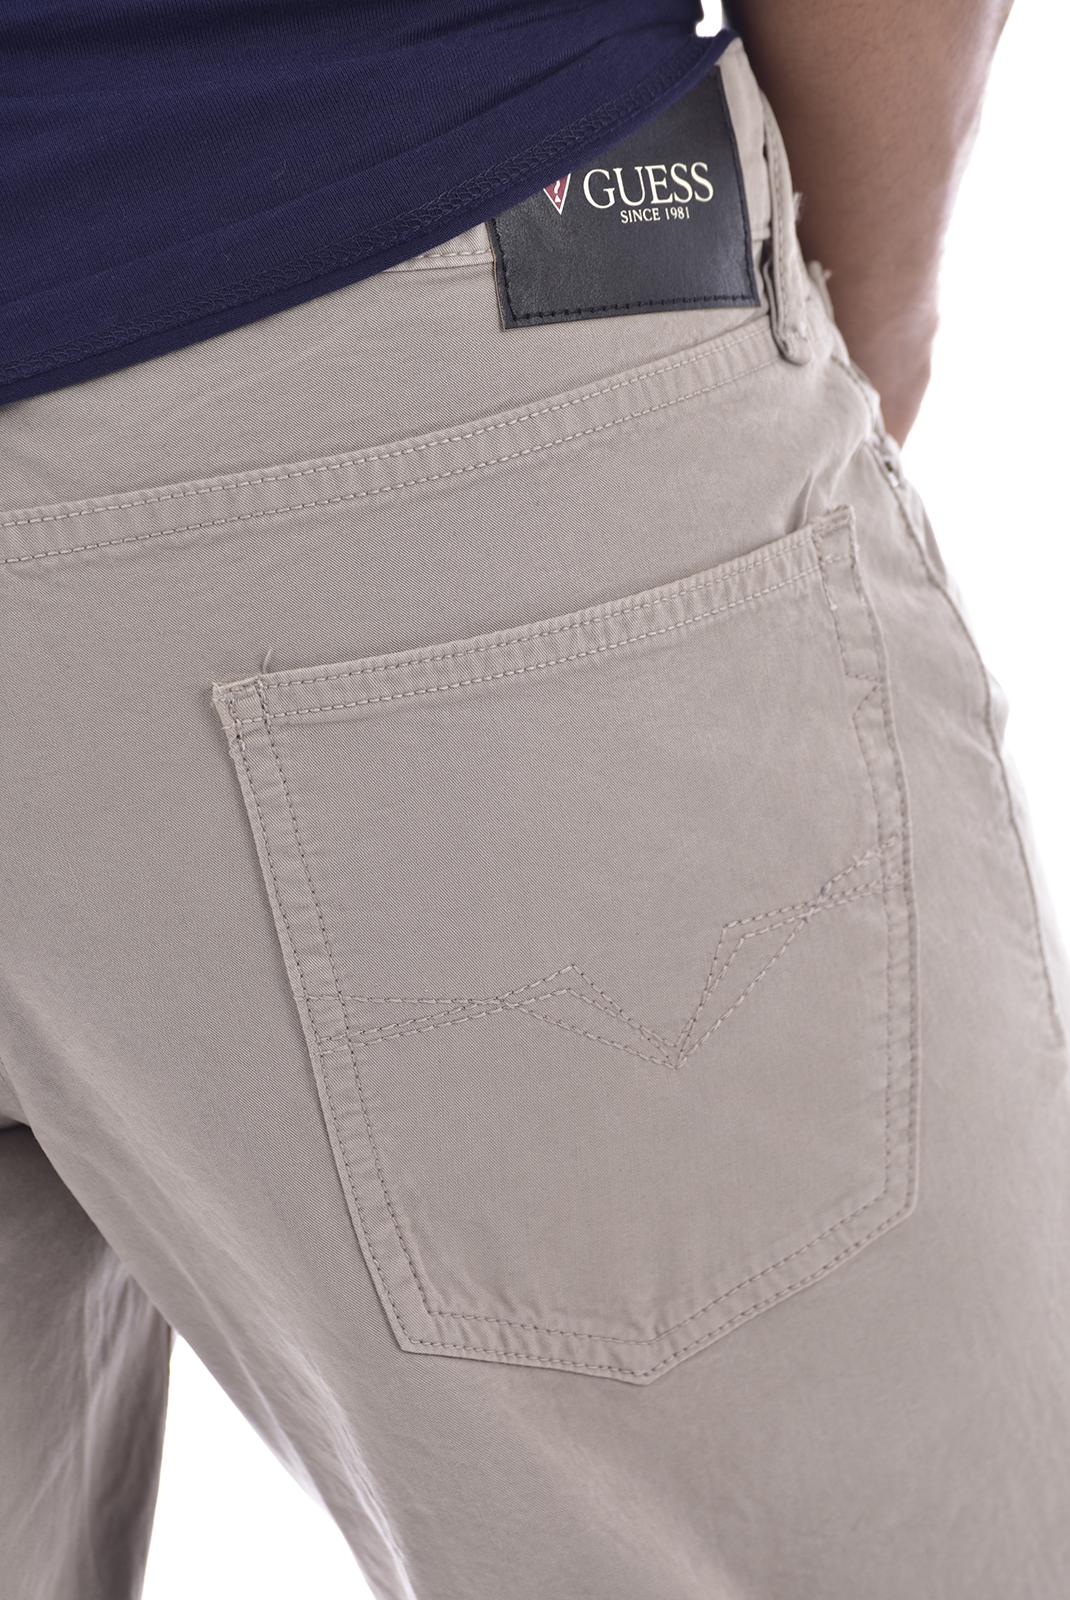 Shorts & Bermudas  Guess jeans M72D01WBC29 BRUN/ANCIENT SAND